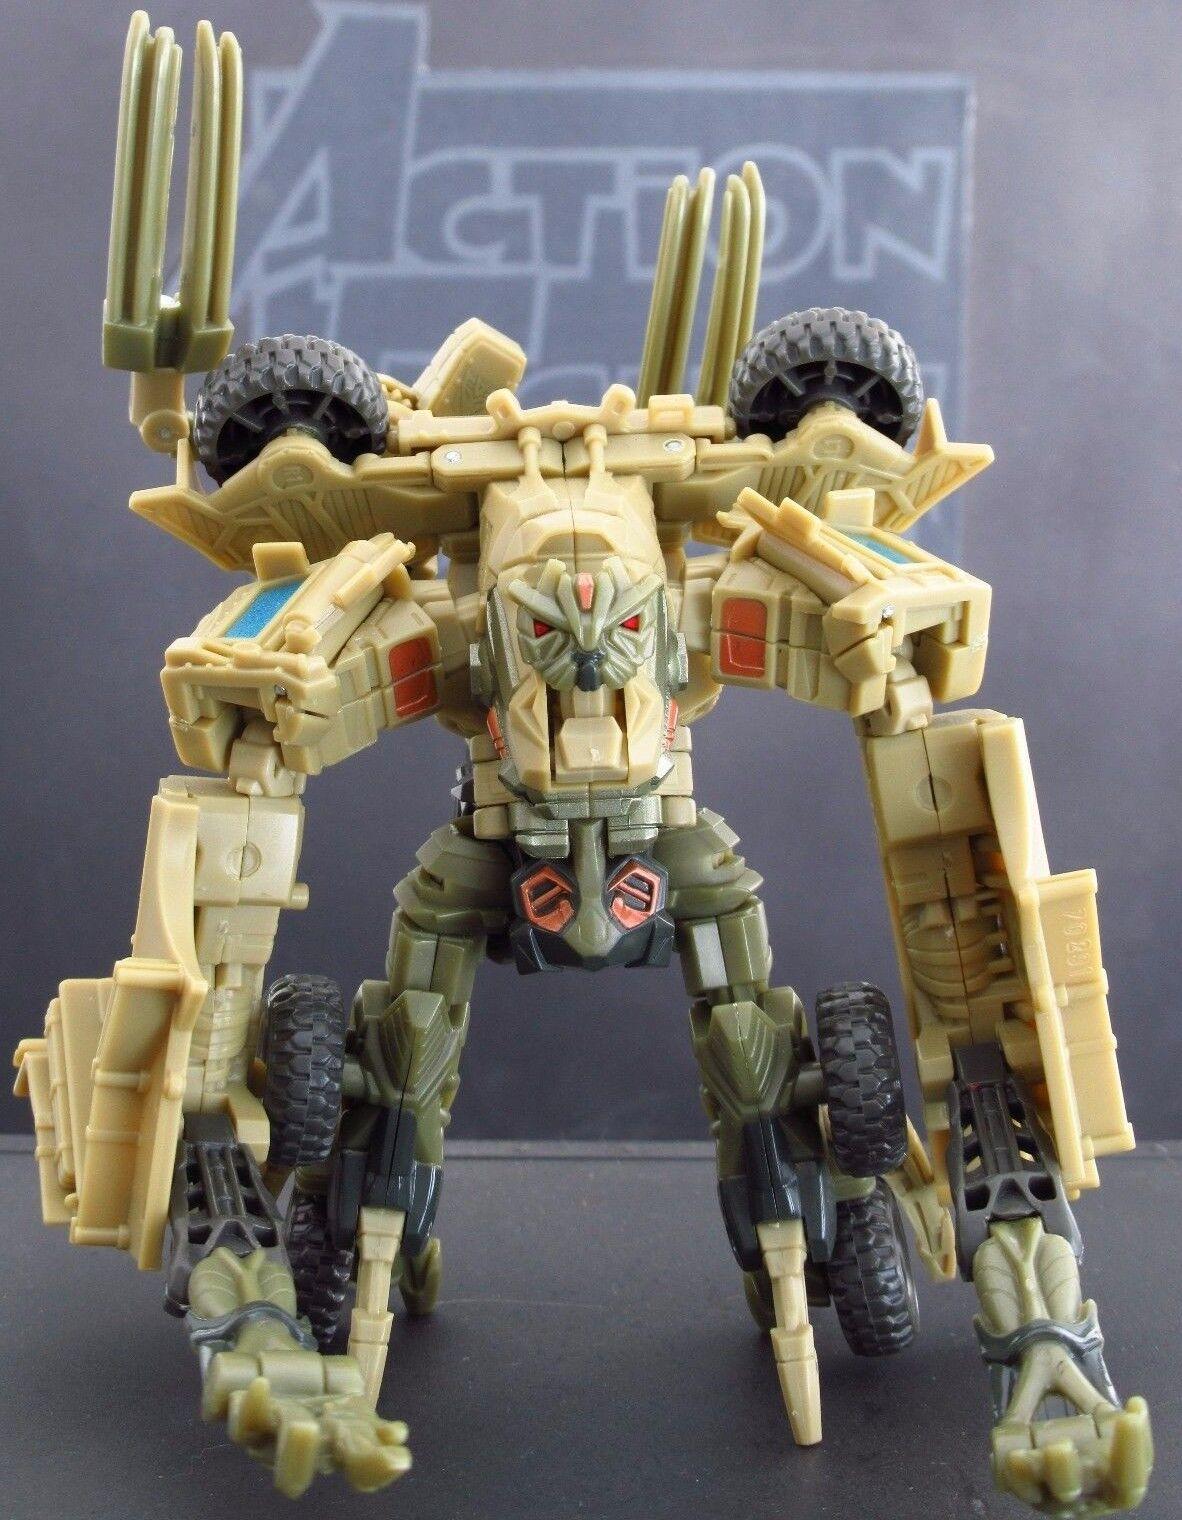 BONECRUSHER 2007 Transformers Movie Deluxe Action Figure Toy Robot Decepticon